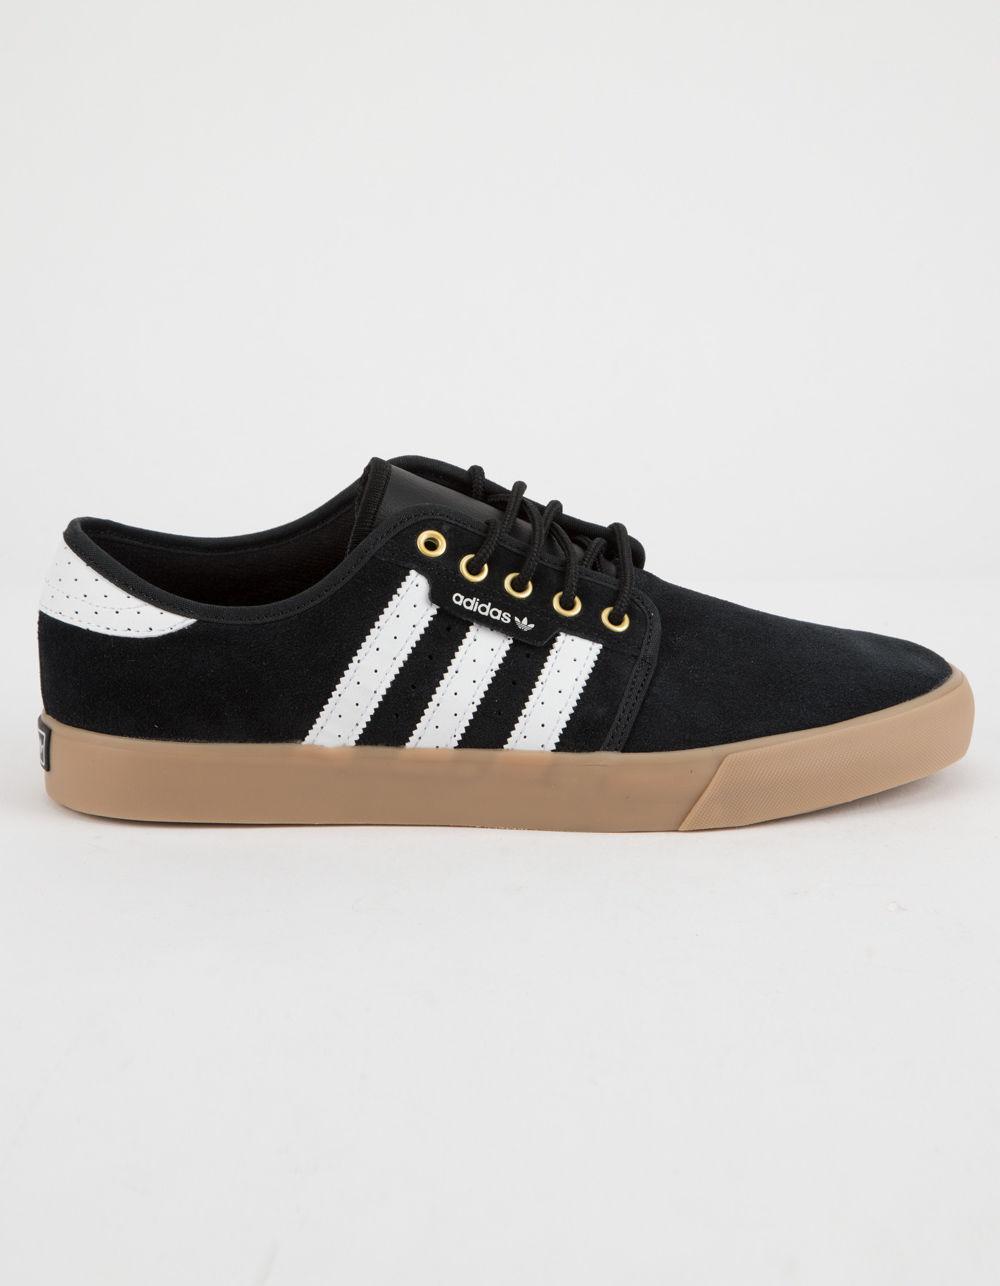 a58f7d8f5400 Adidas - Black Seeley for Men - Lyst. View fullscreen